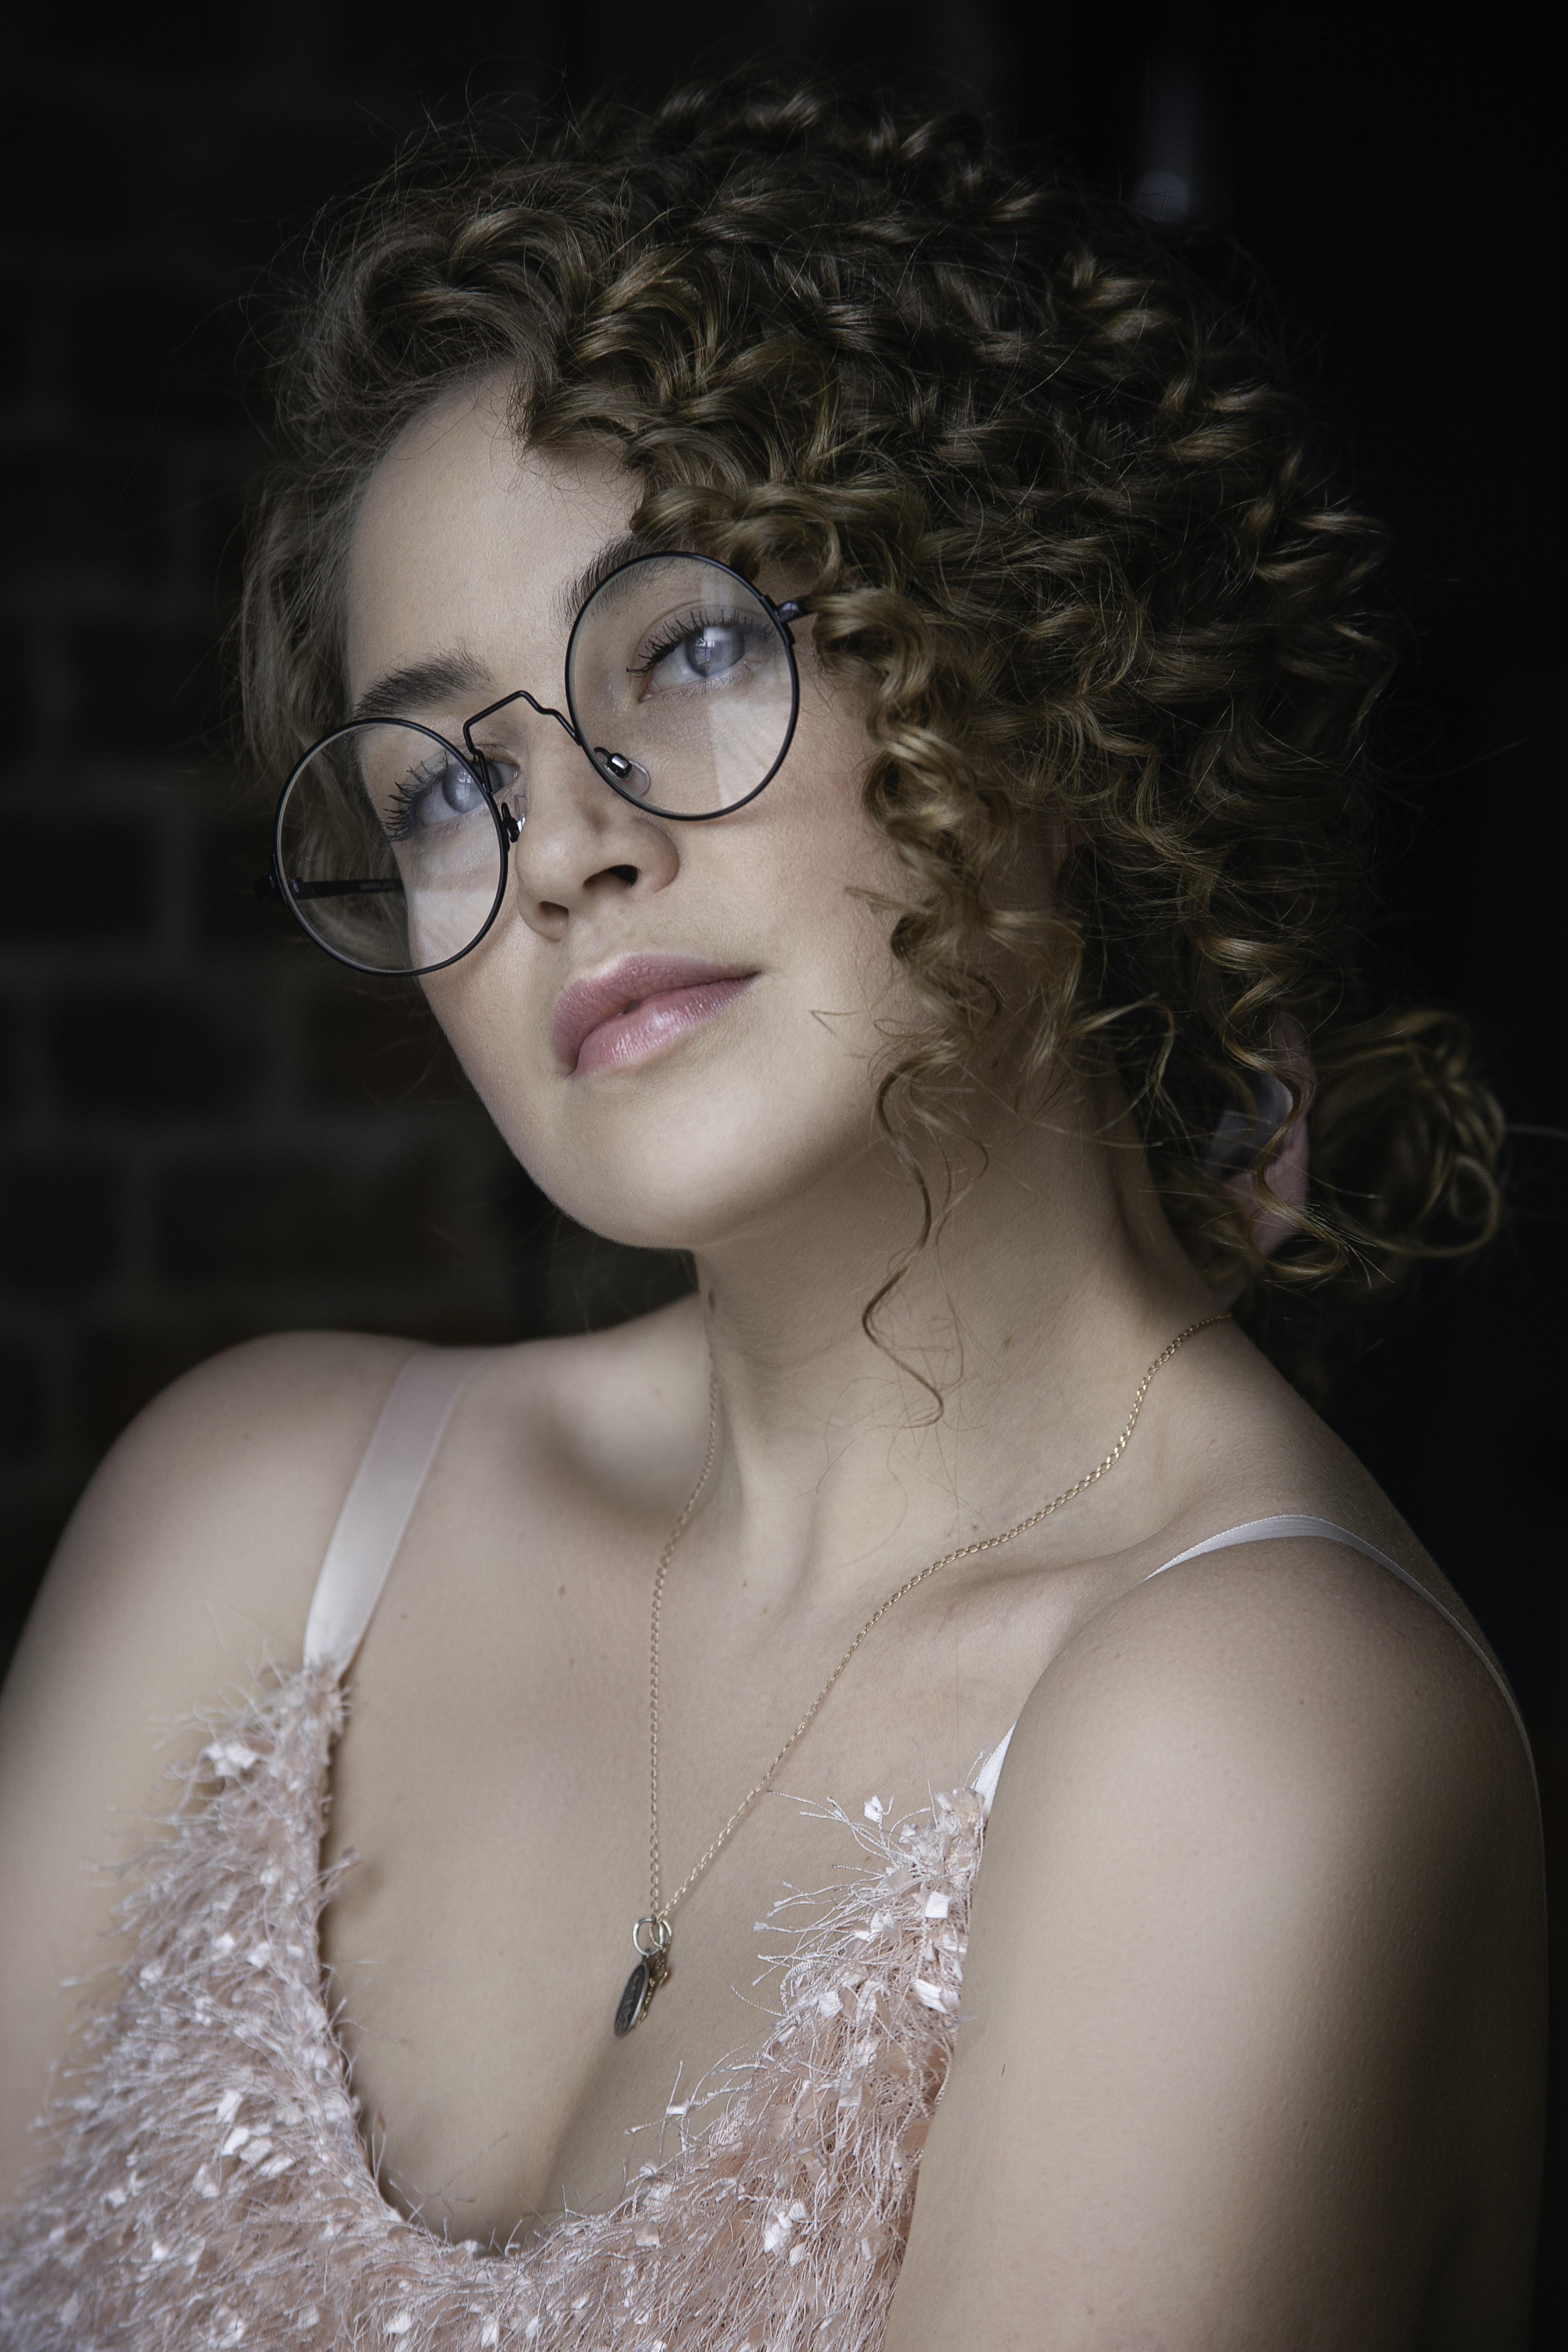 women's pink fur spaghetti strap top